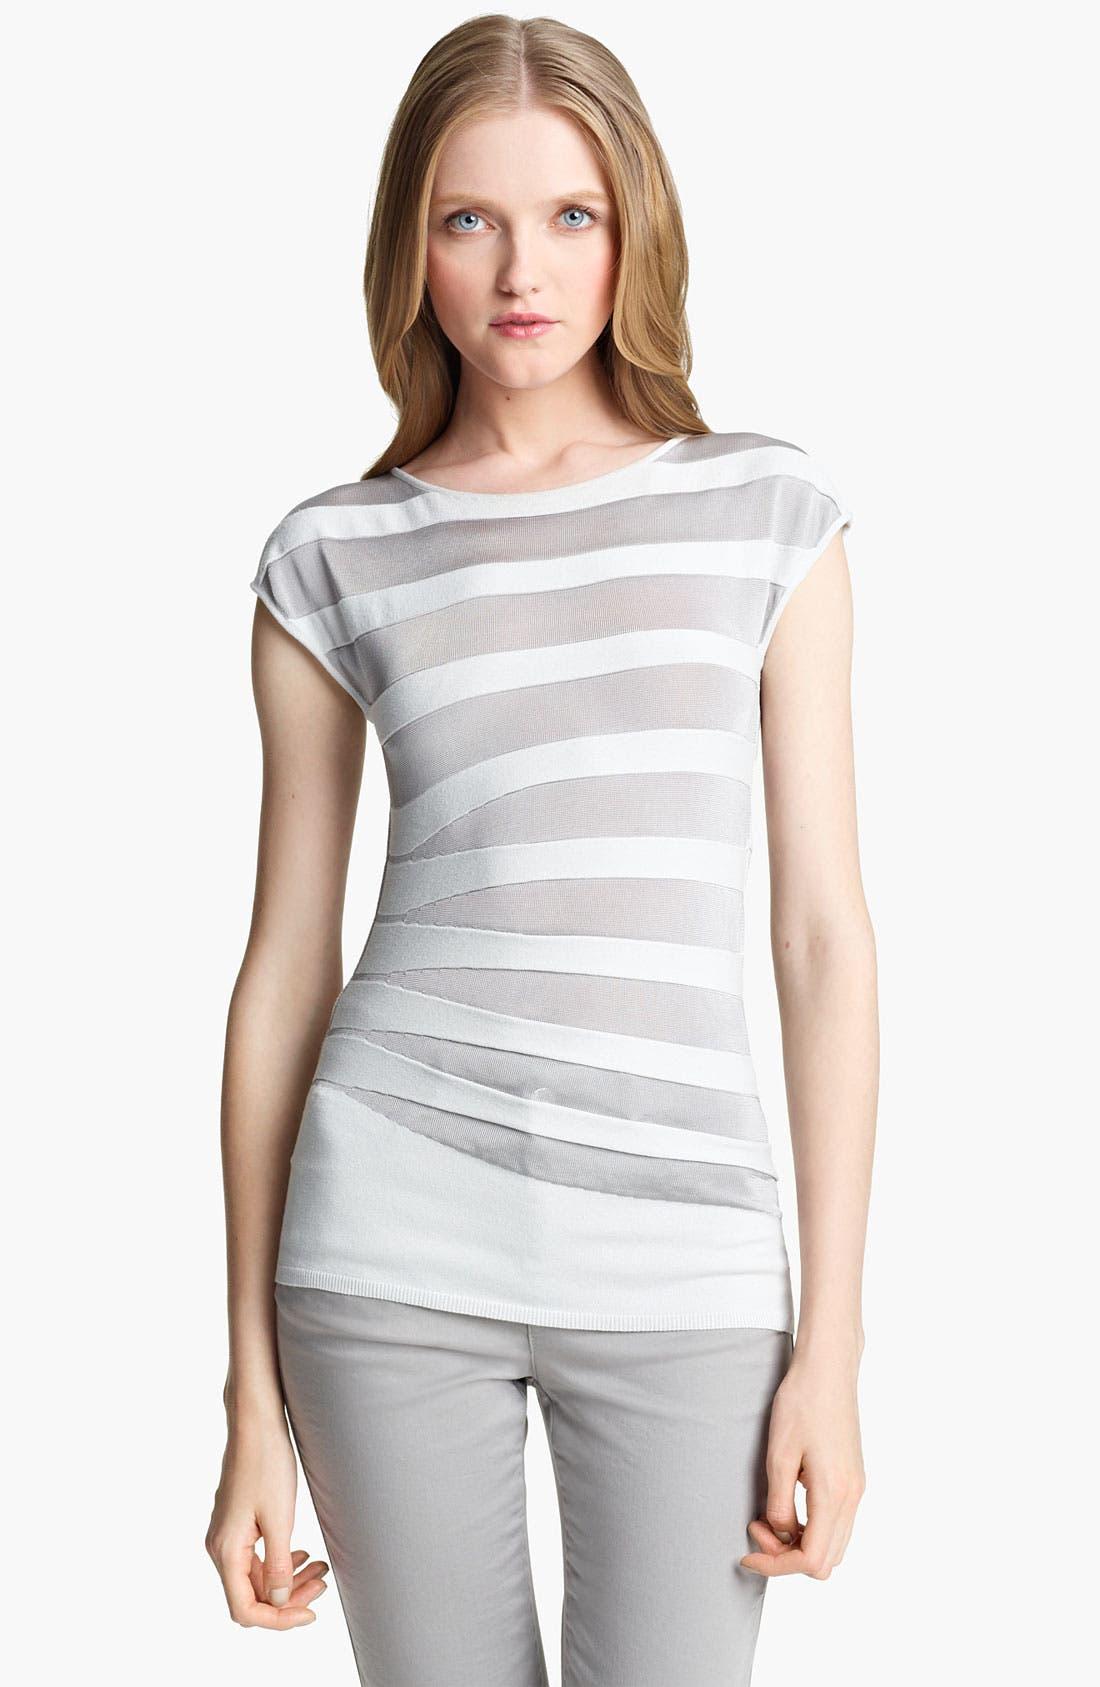 Alternate Image 1 Selected - Armani Collezioni Asymmetrical Stripe Knit Top